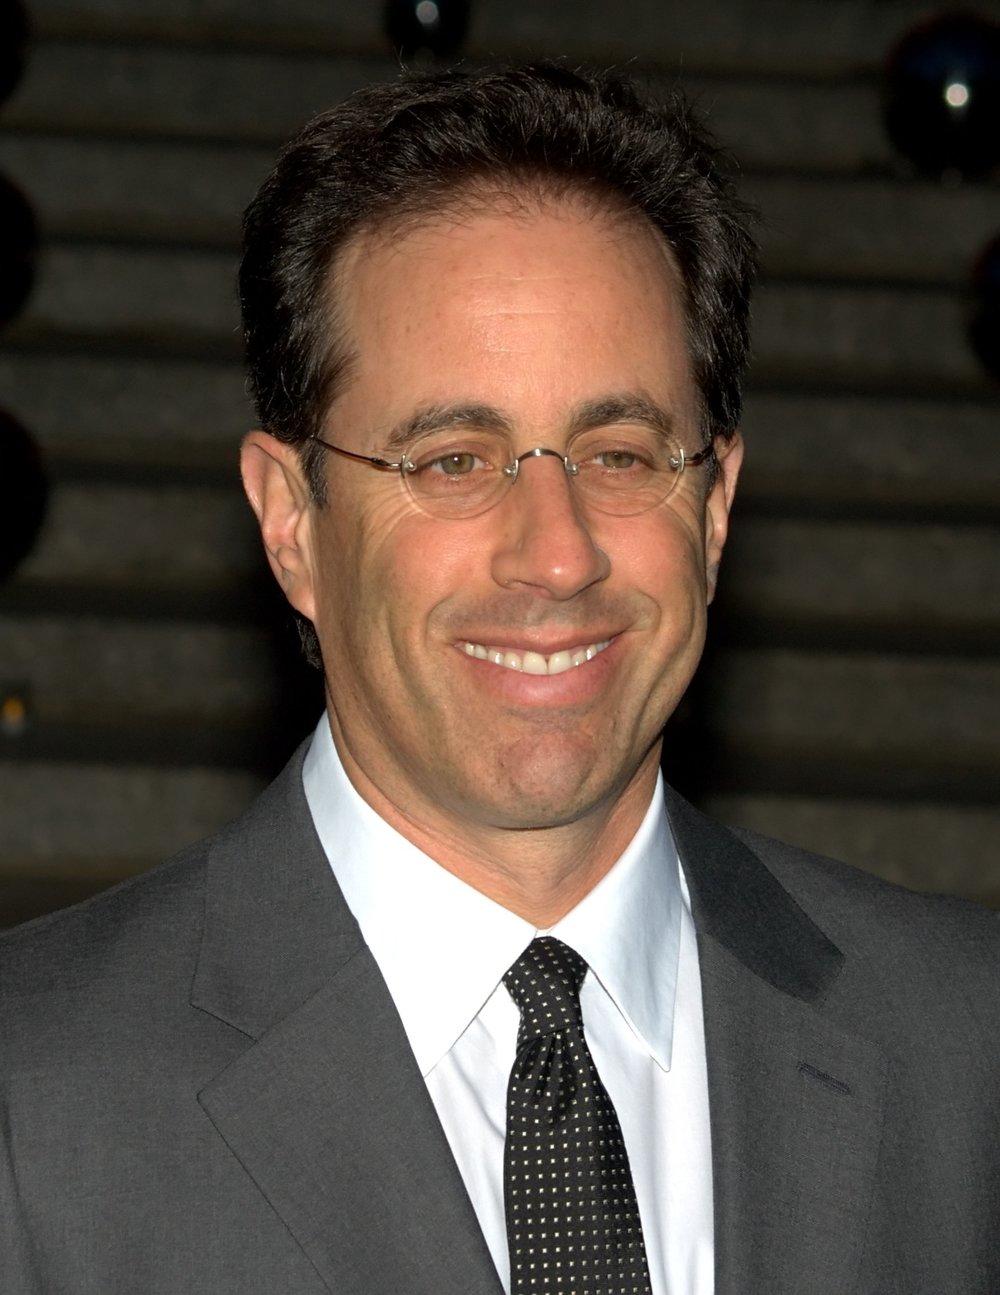 Jerry_Seinfeld_by_David_Shankbone.jpg